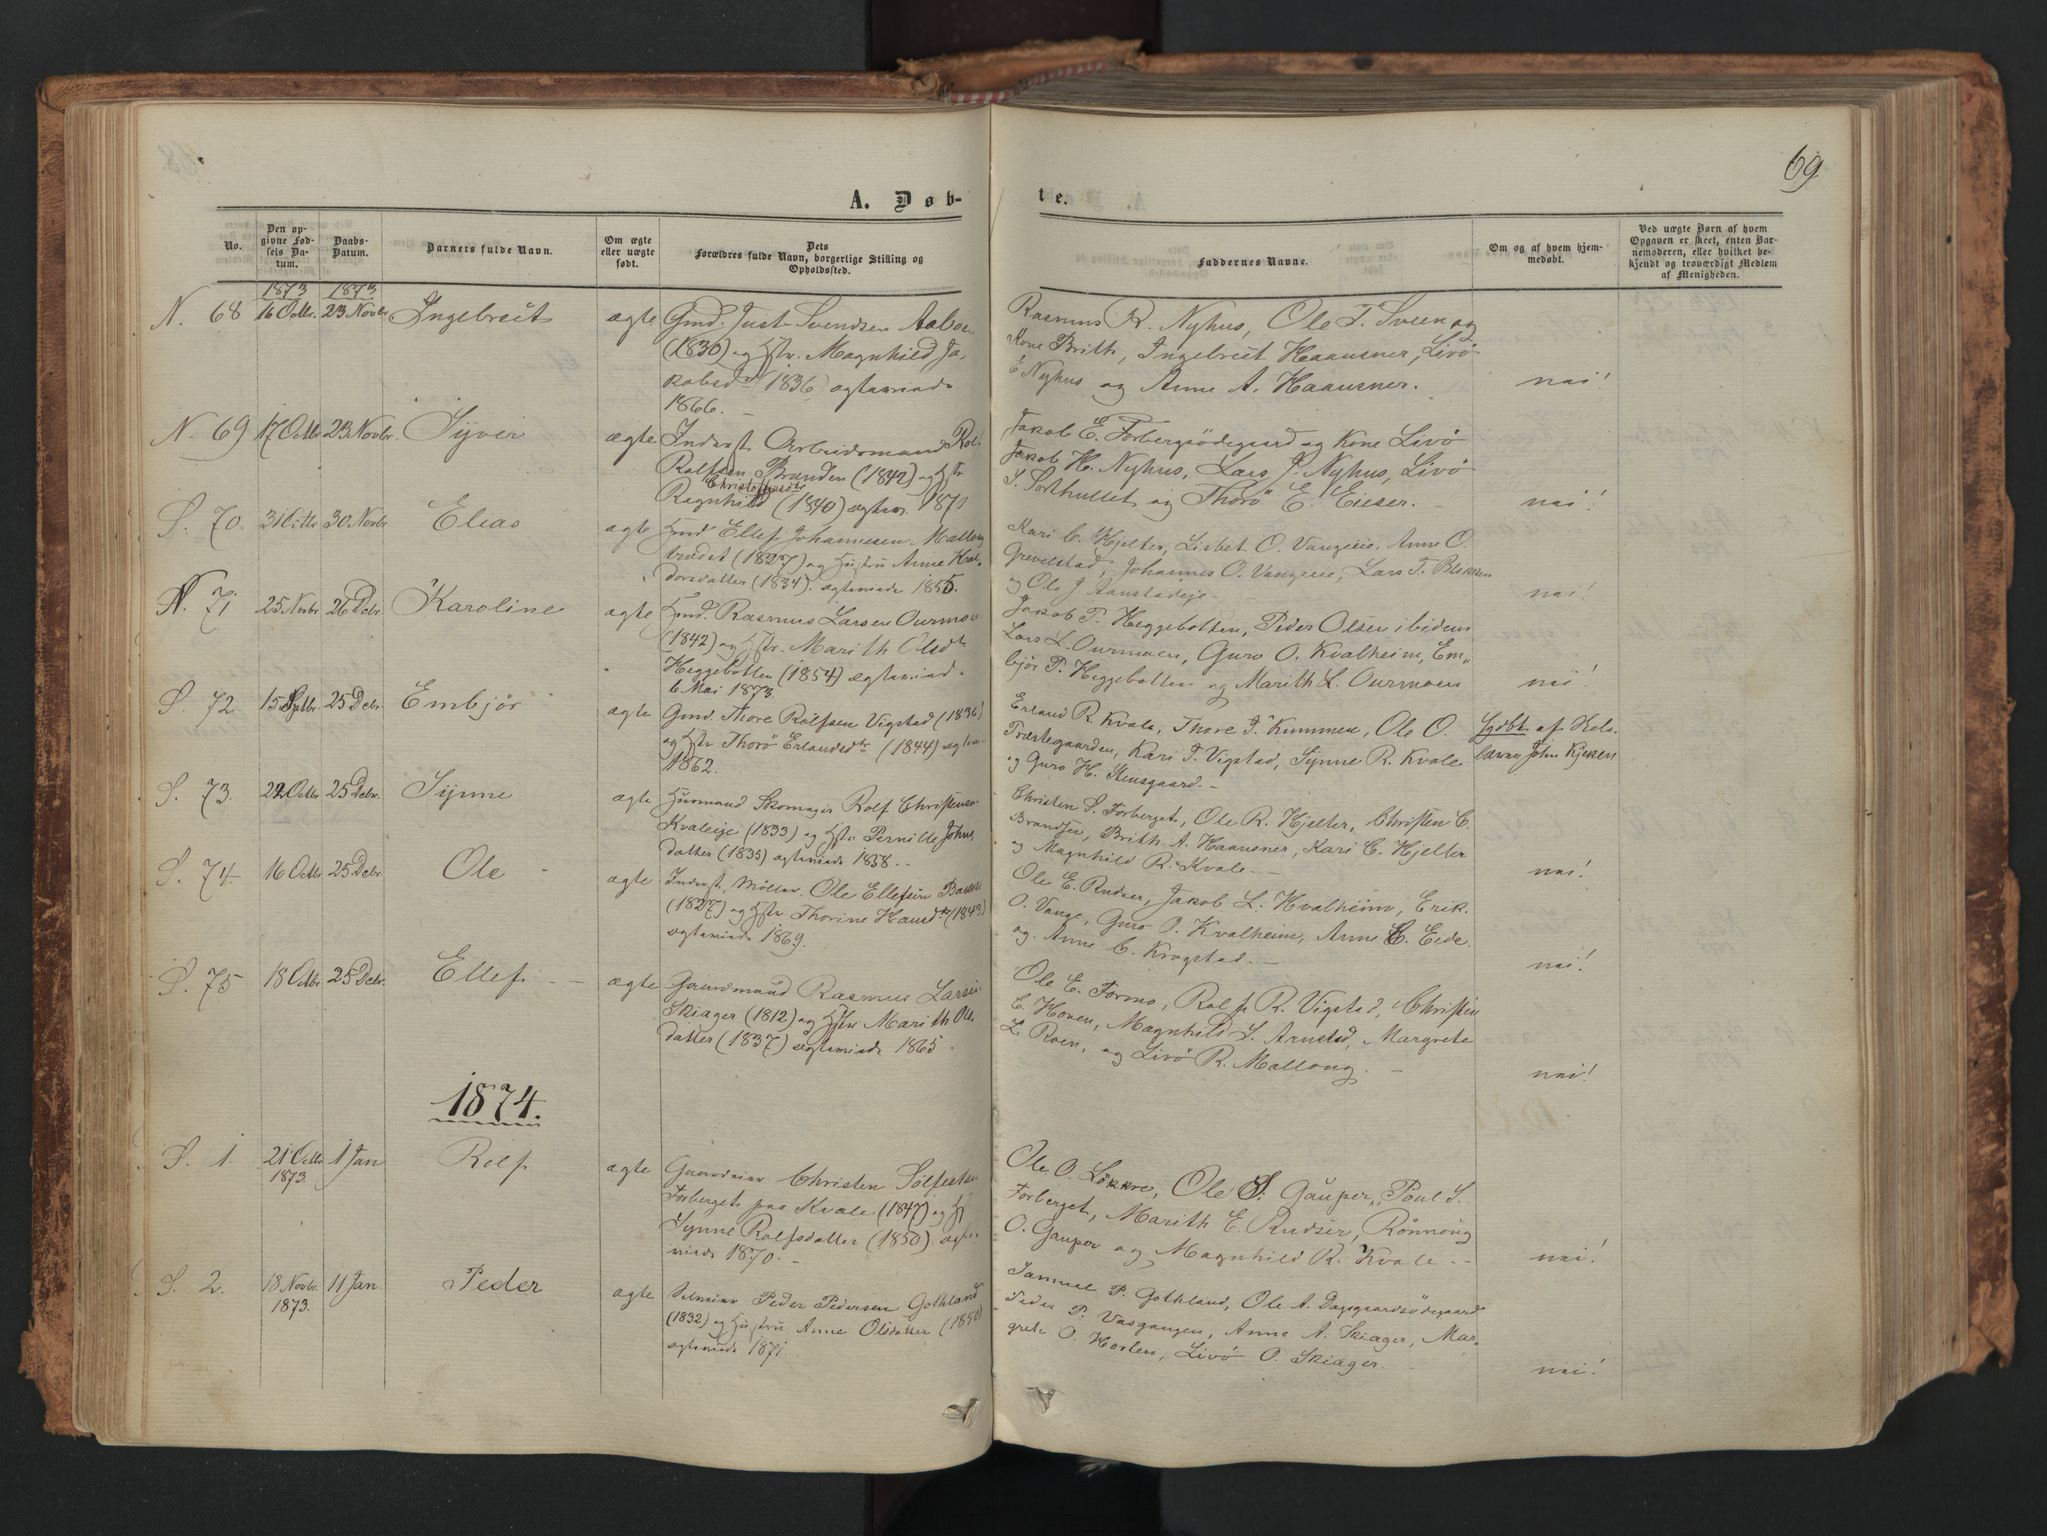 SAH, Skjåk prestekontor, Ministerialbok nr. 1, 1863-1879, s. 69